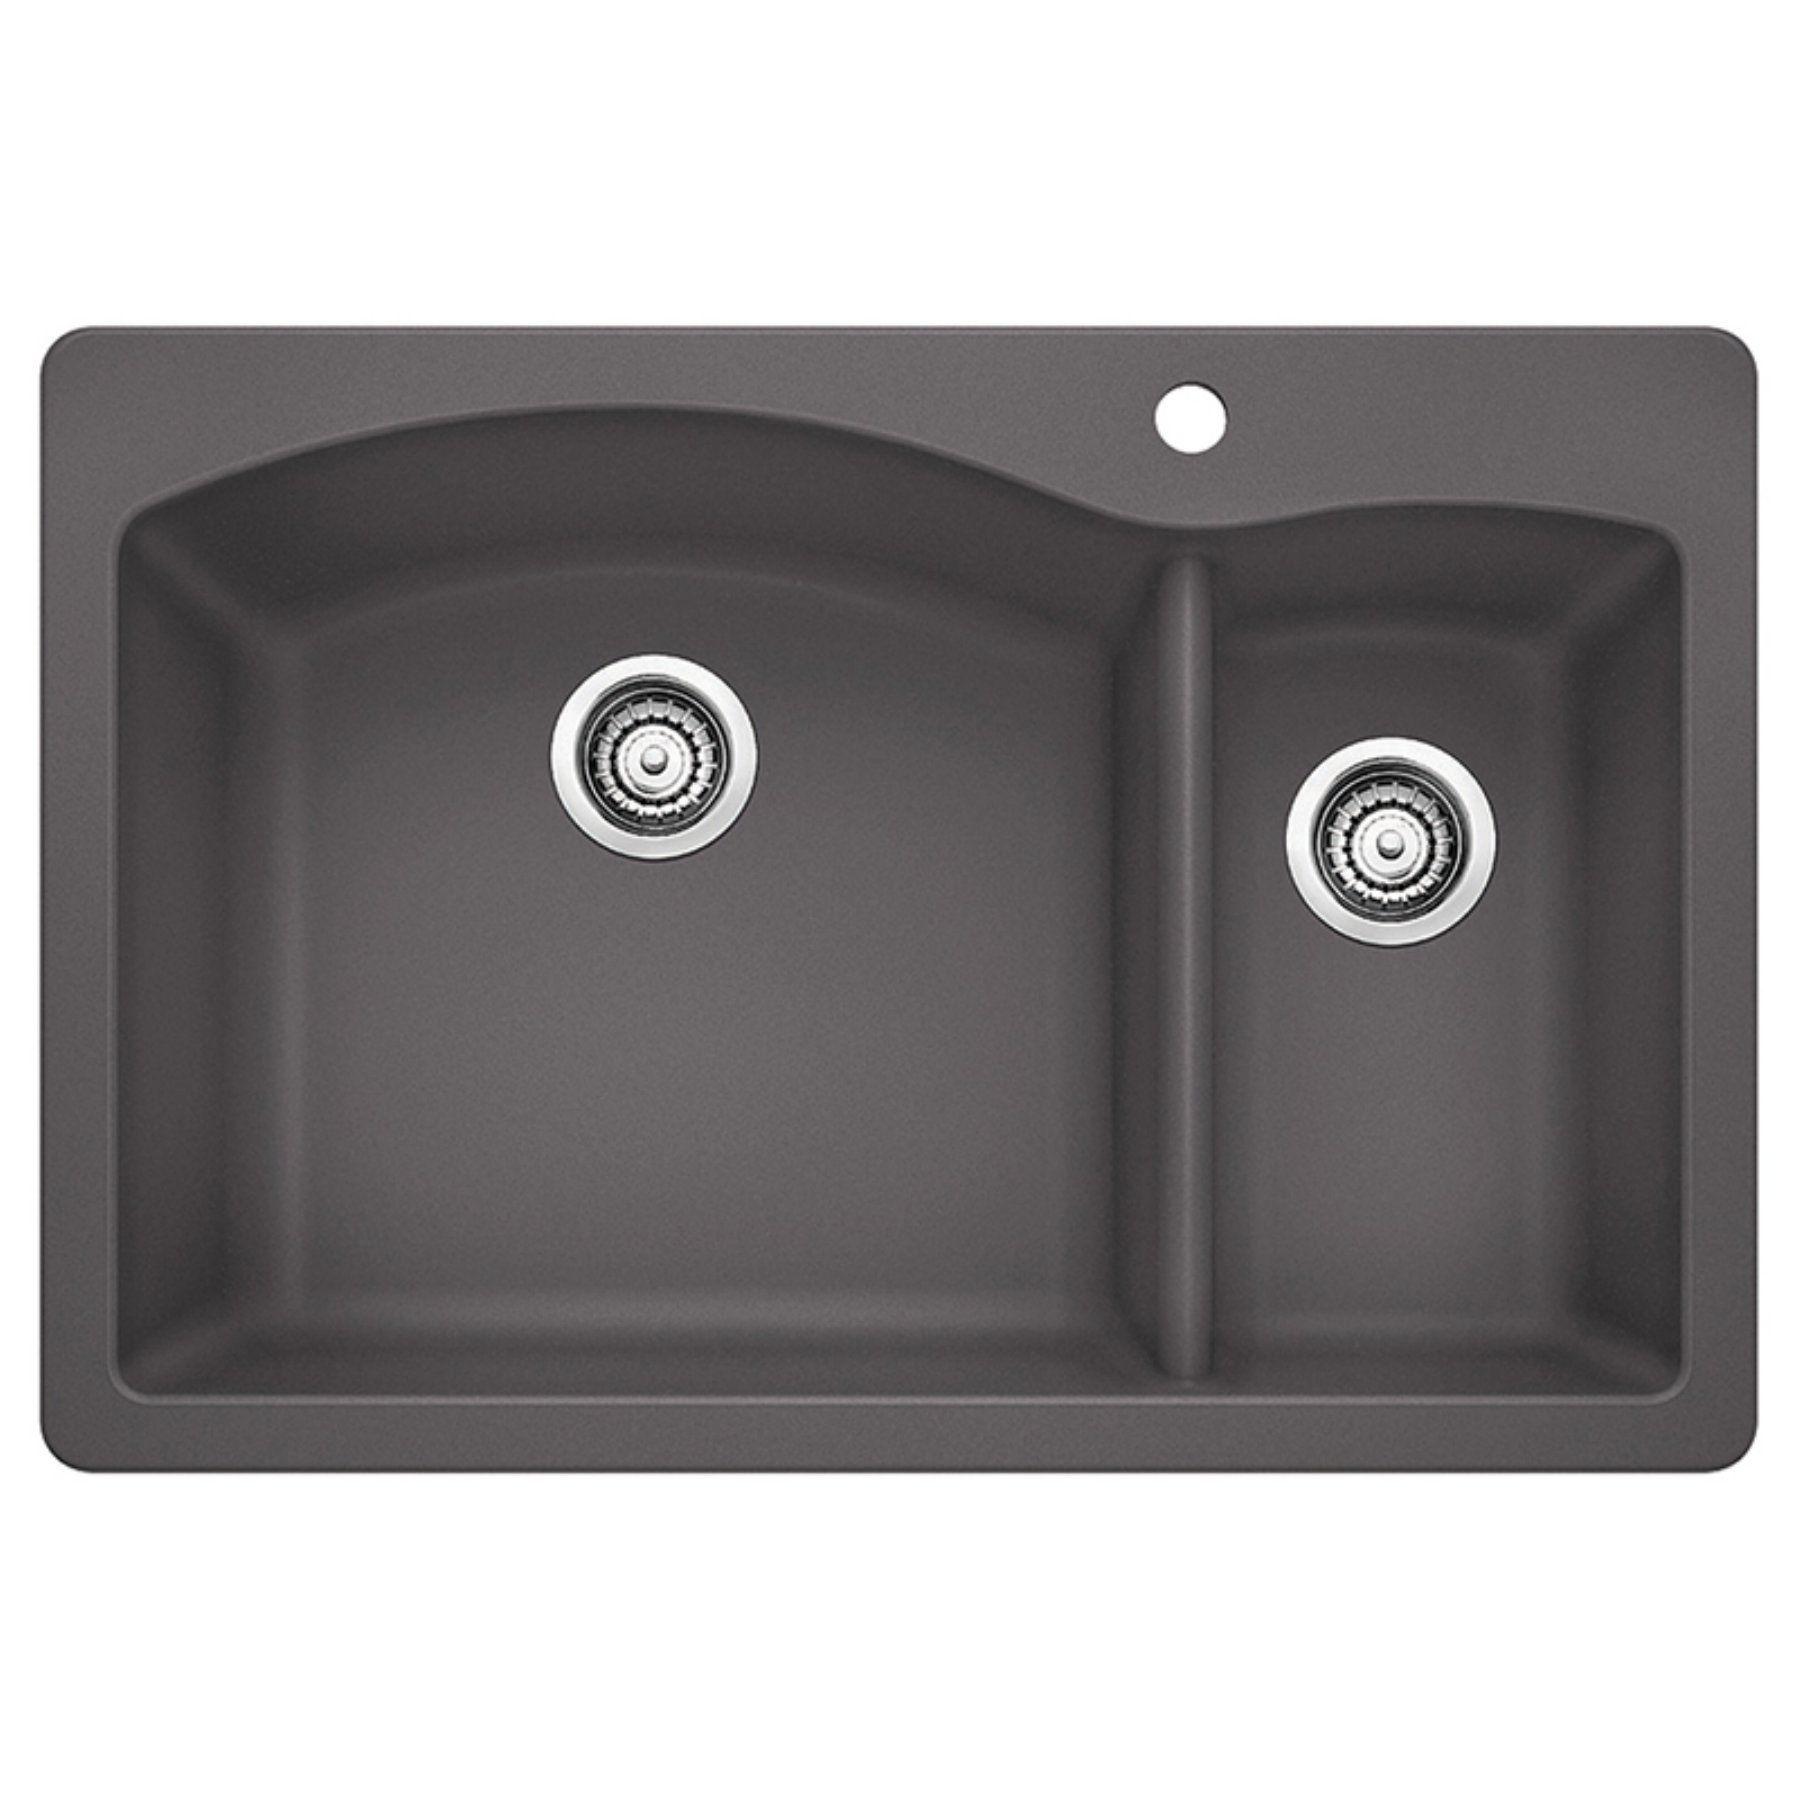 Blanco Diamond 33 in. Double Basin Drop In / Undermount Kitchen Sink - Cinder - 441464